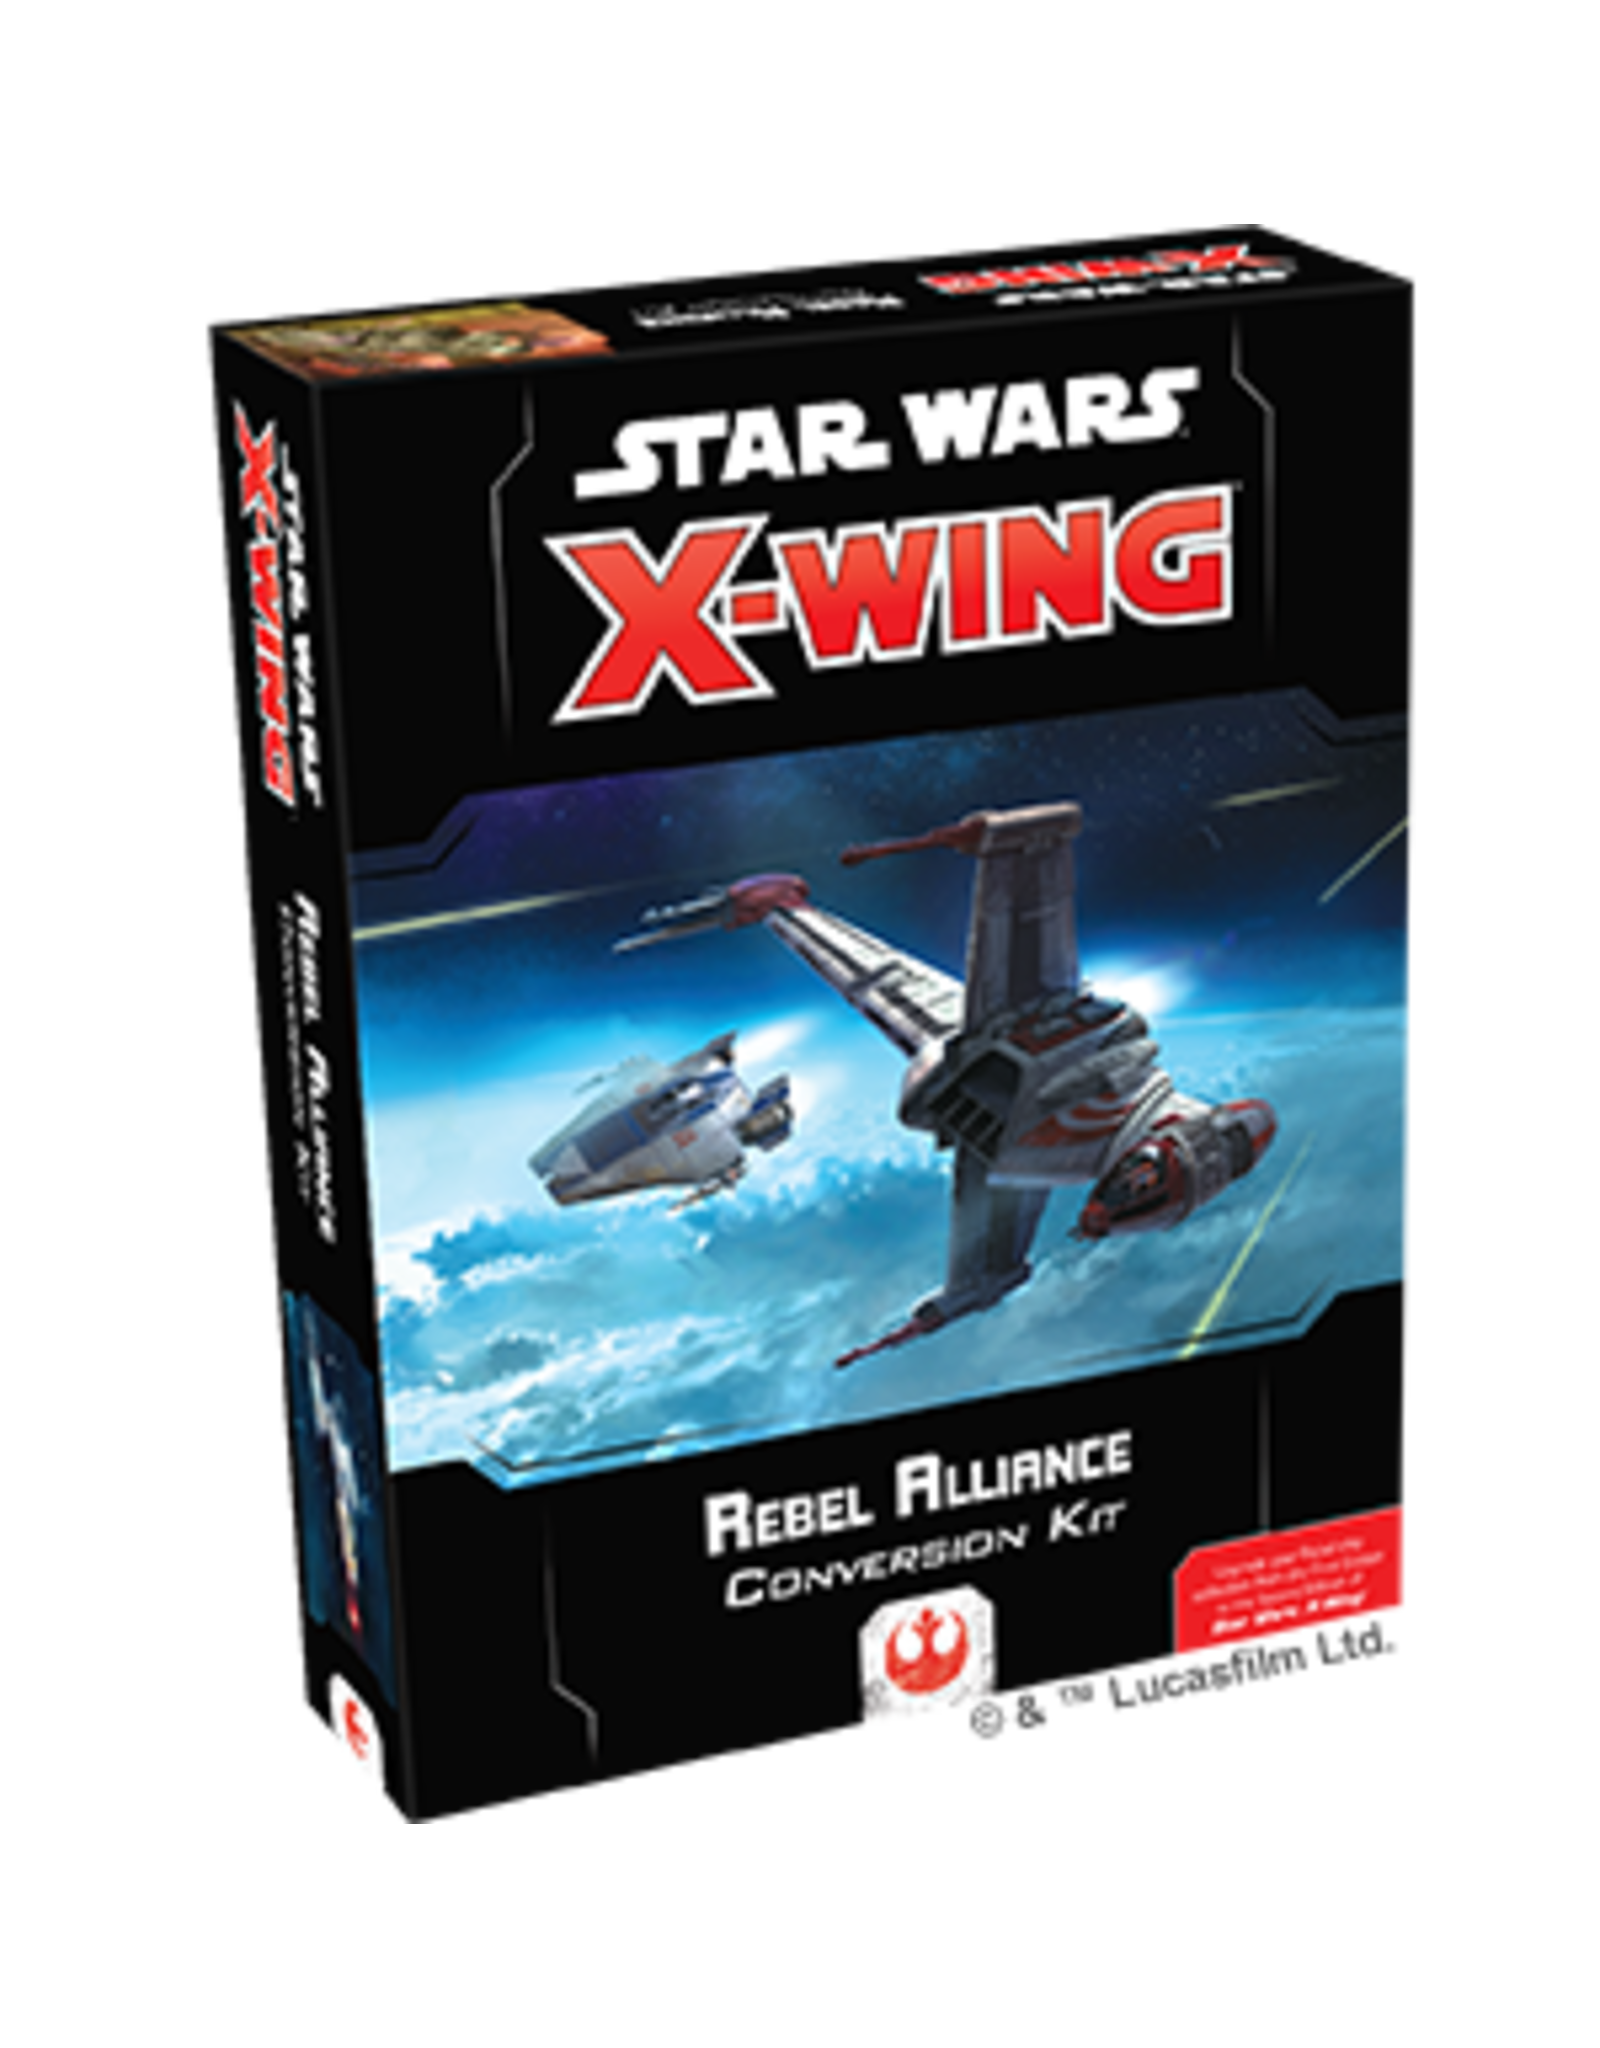 Fantasy Flight Games Star Wars X-wing 2E: Rebel Alliance Conversion Kit